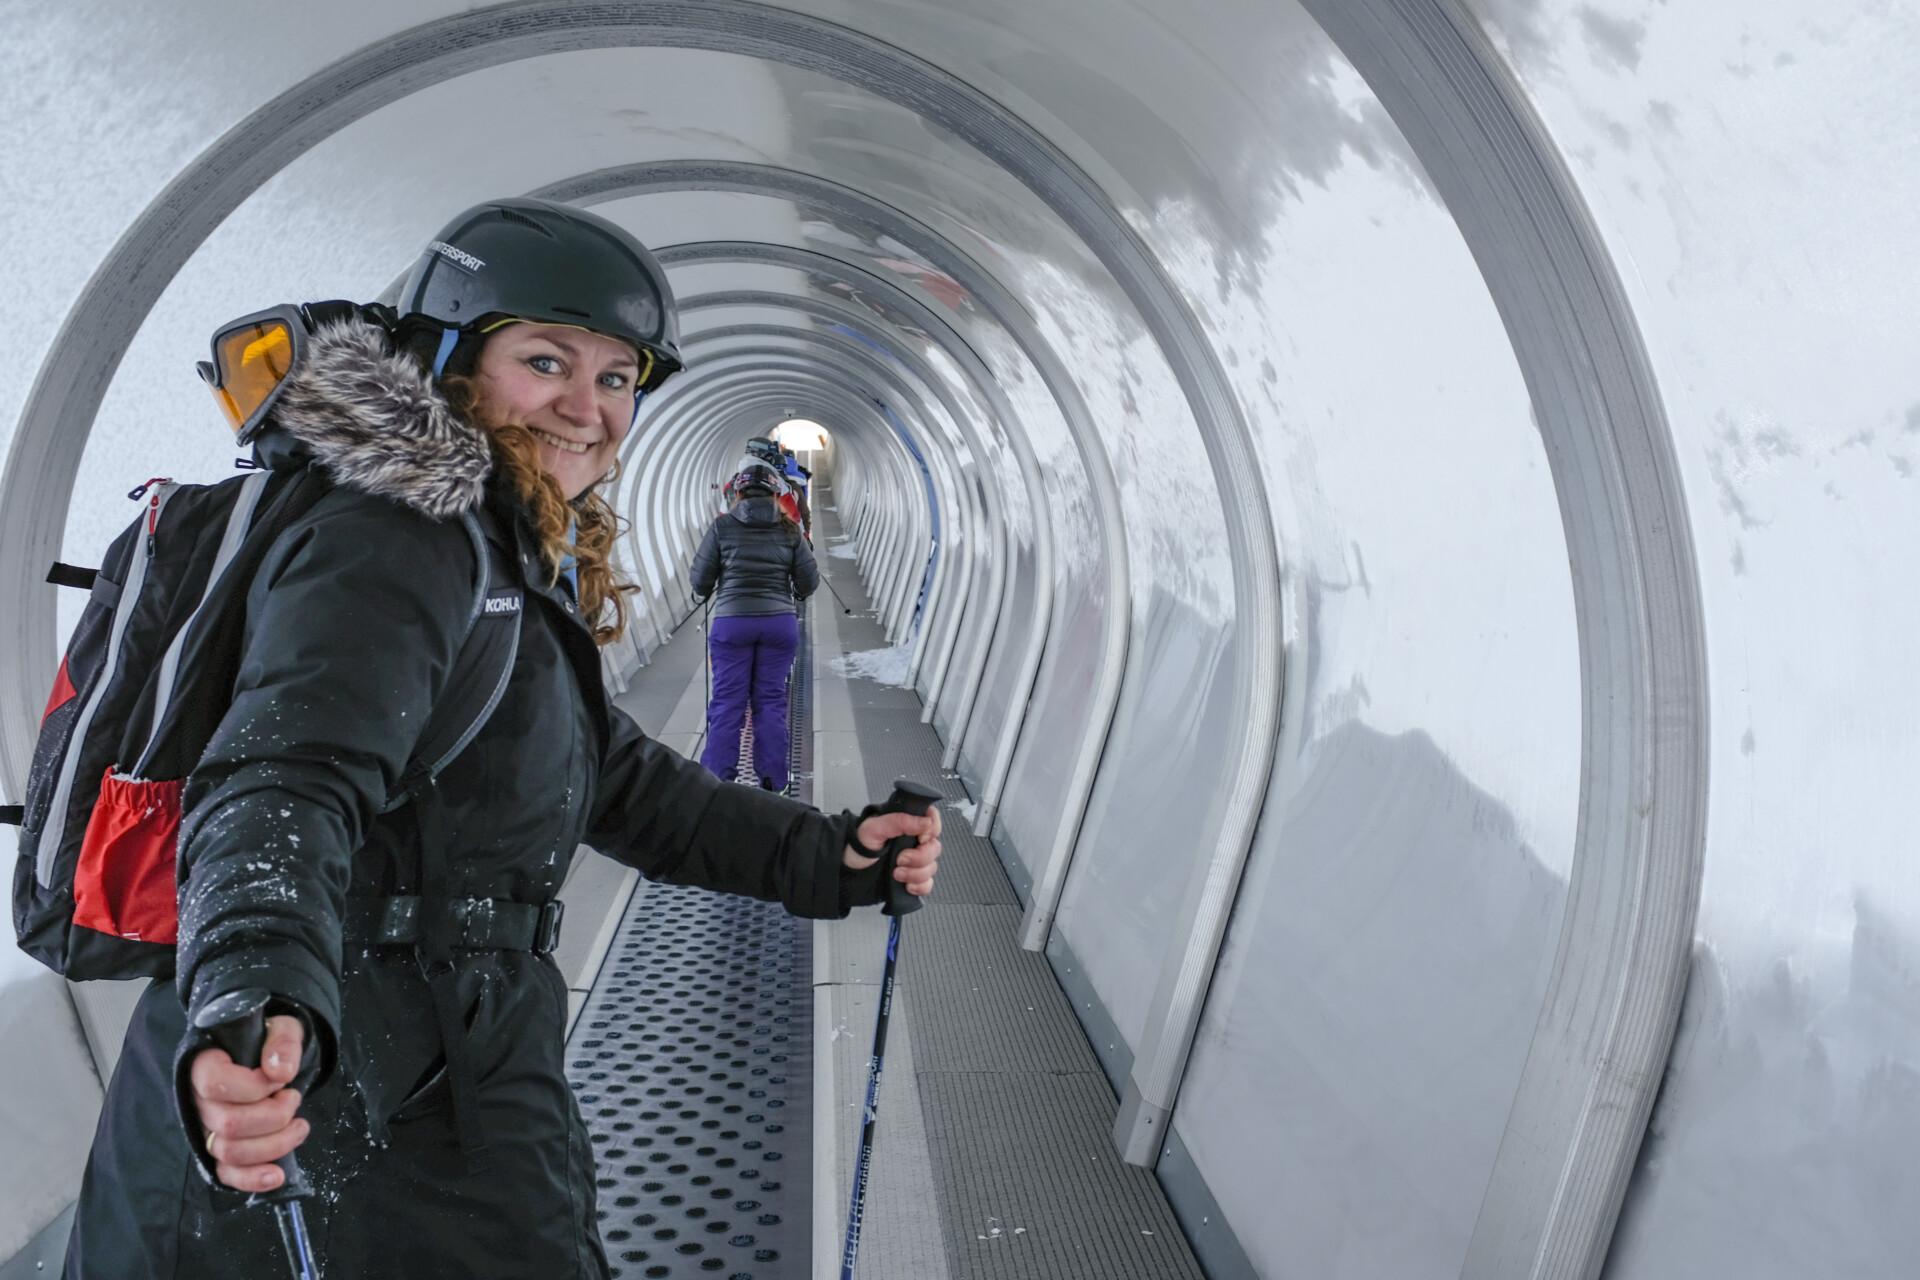 Skiskole lift